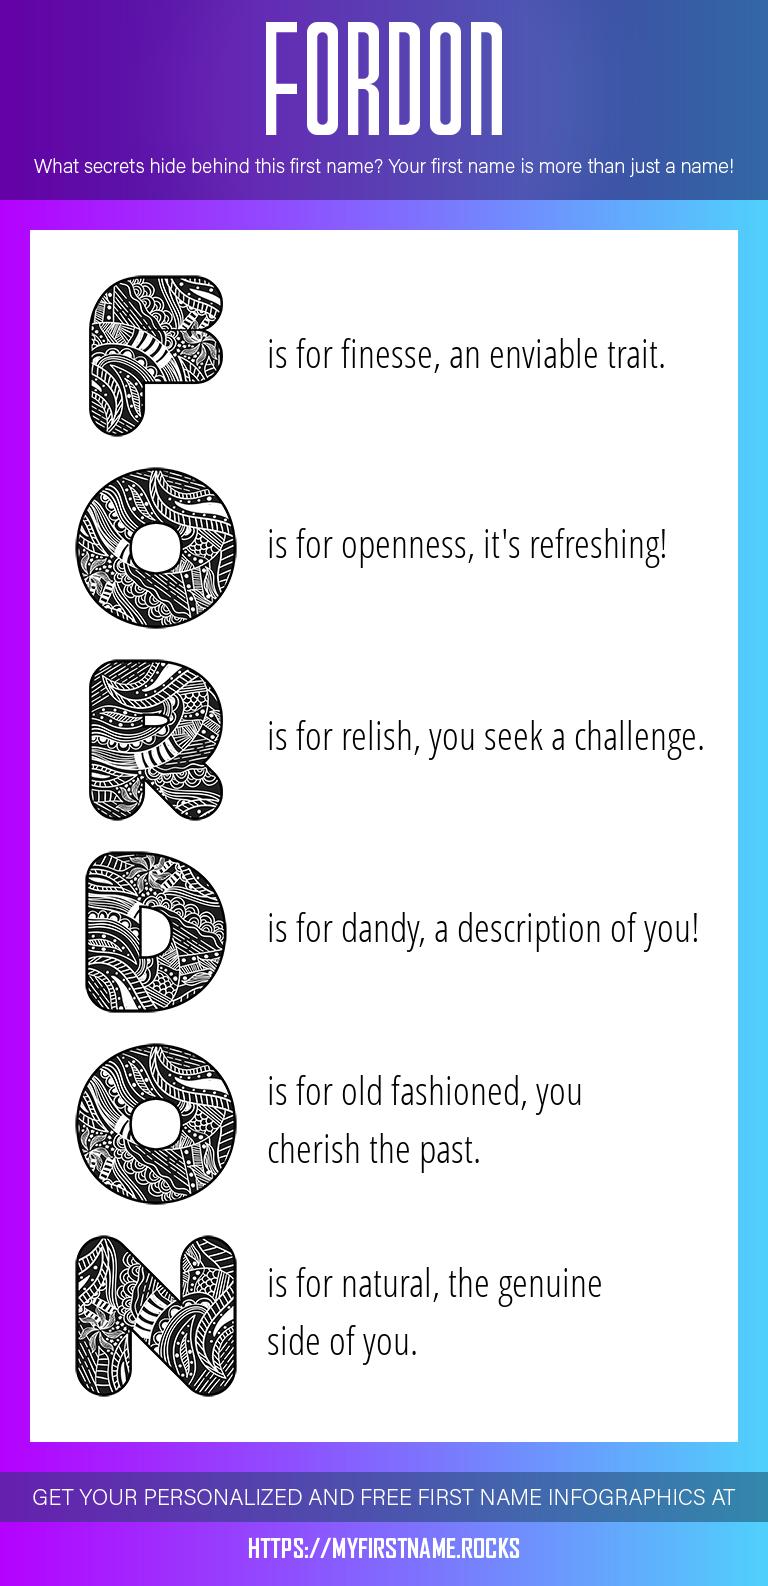 Fordon Infographics